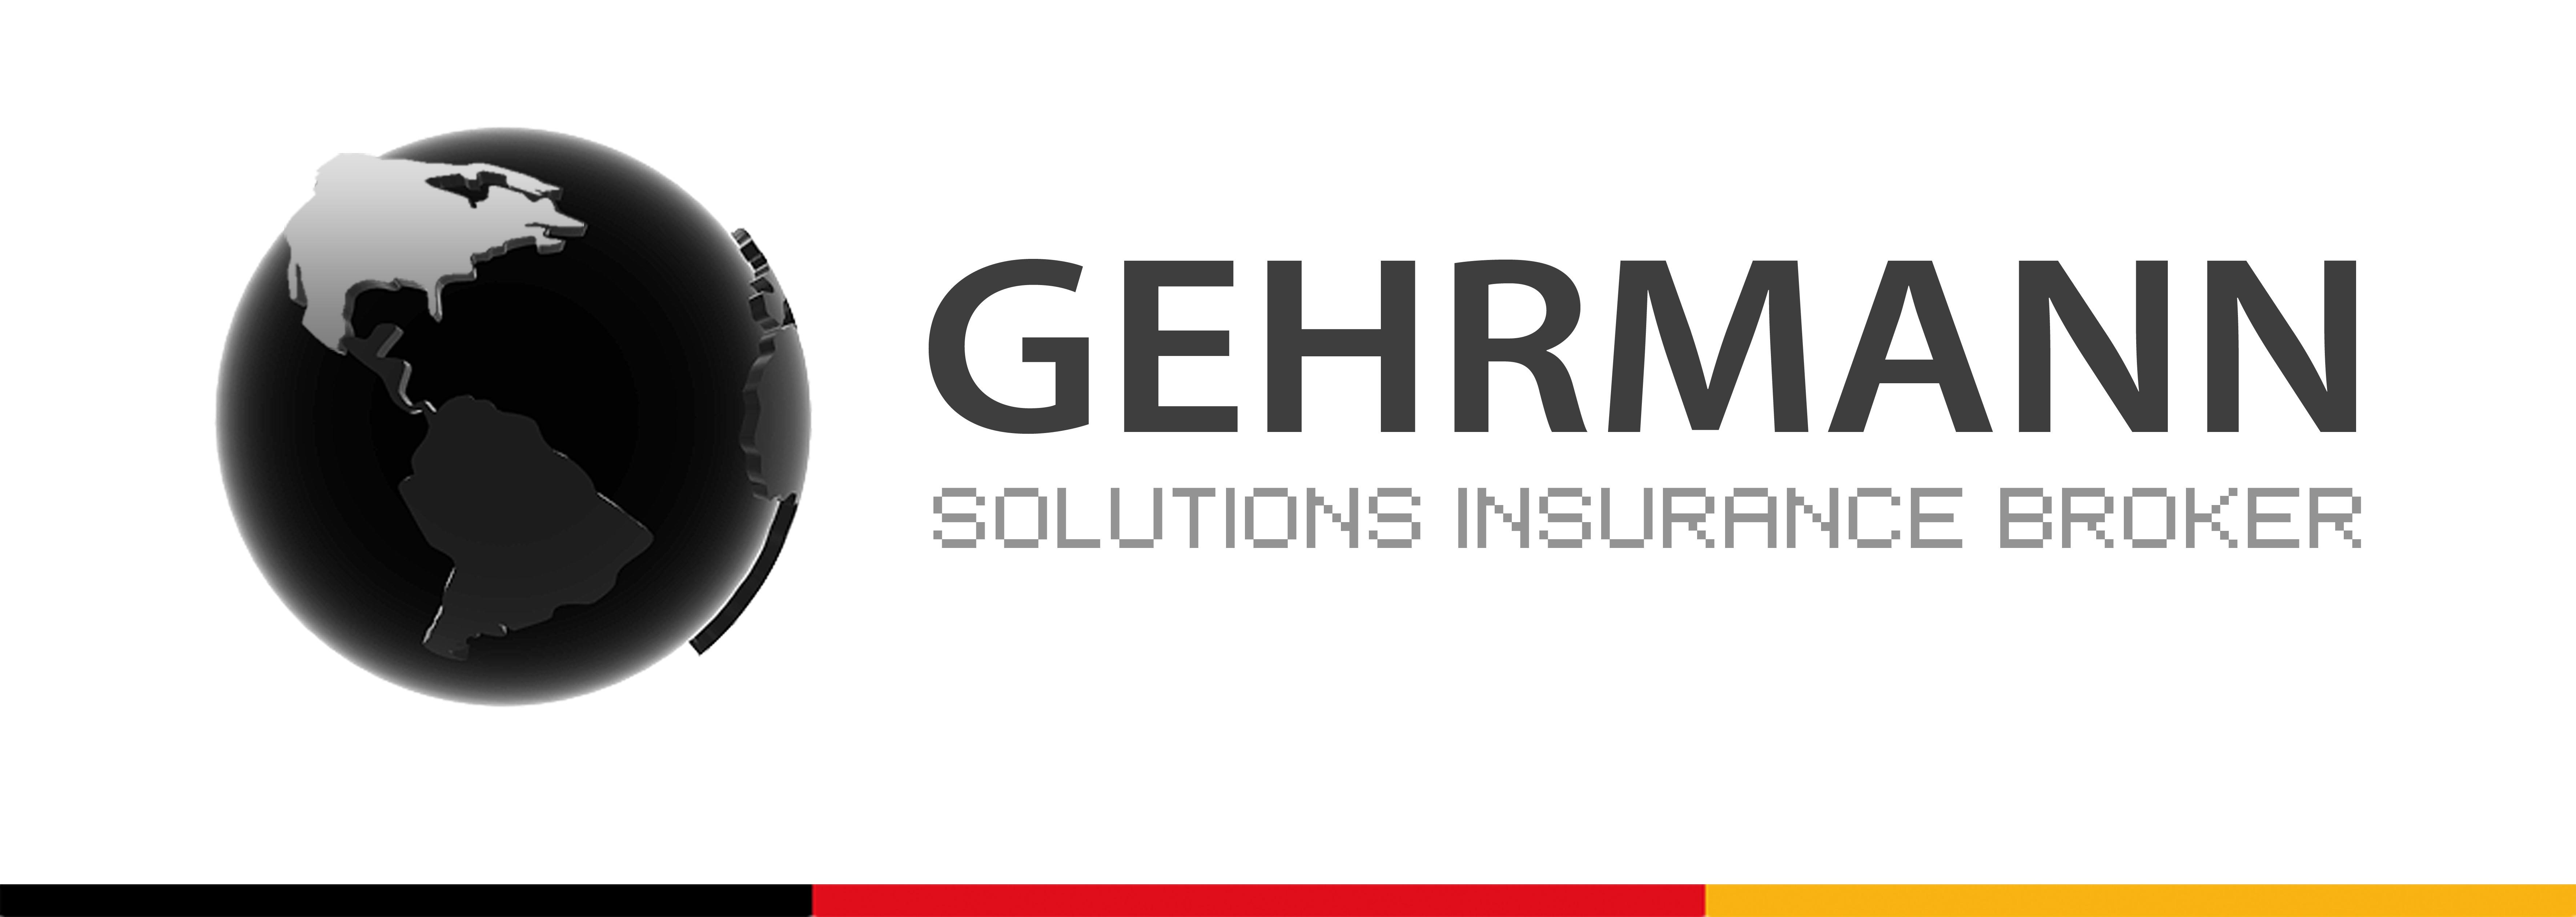 gehrmann-logo